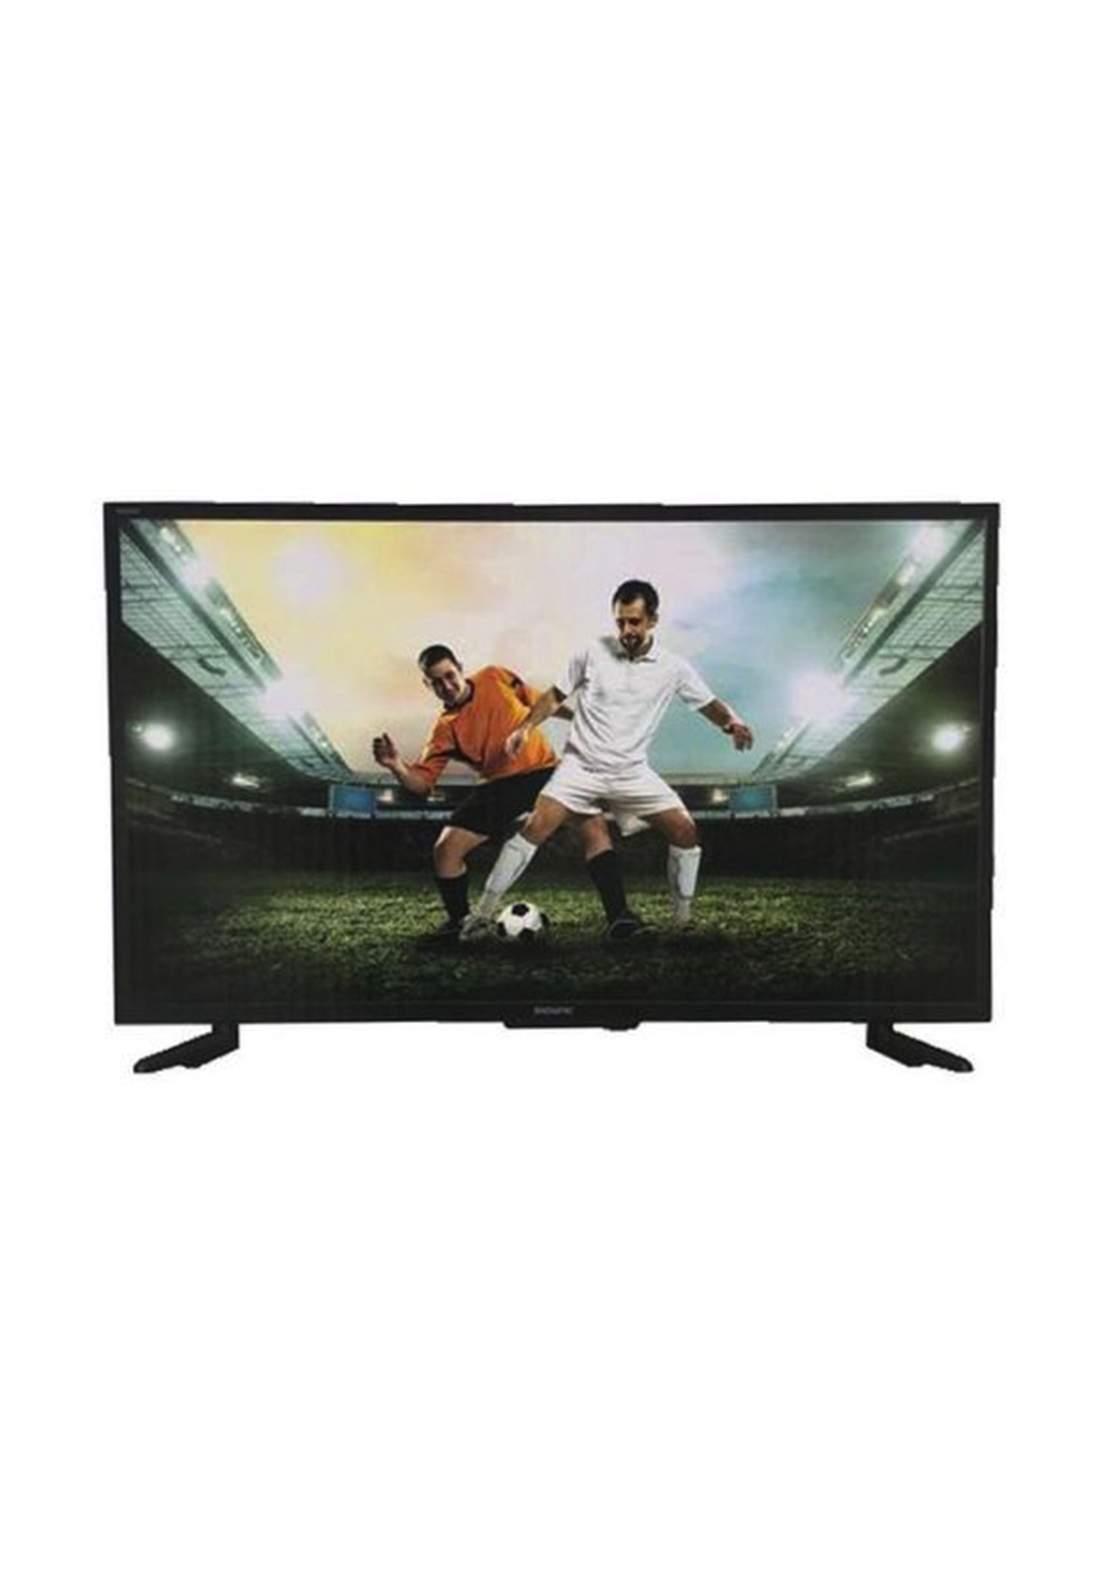 Shownic TD-F2243V - 43 FHD - LED TV شاشة